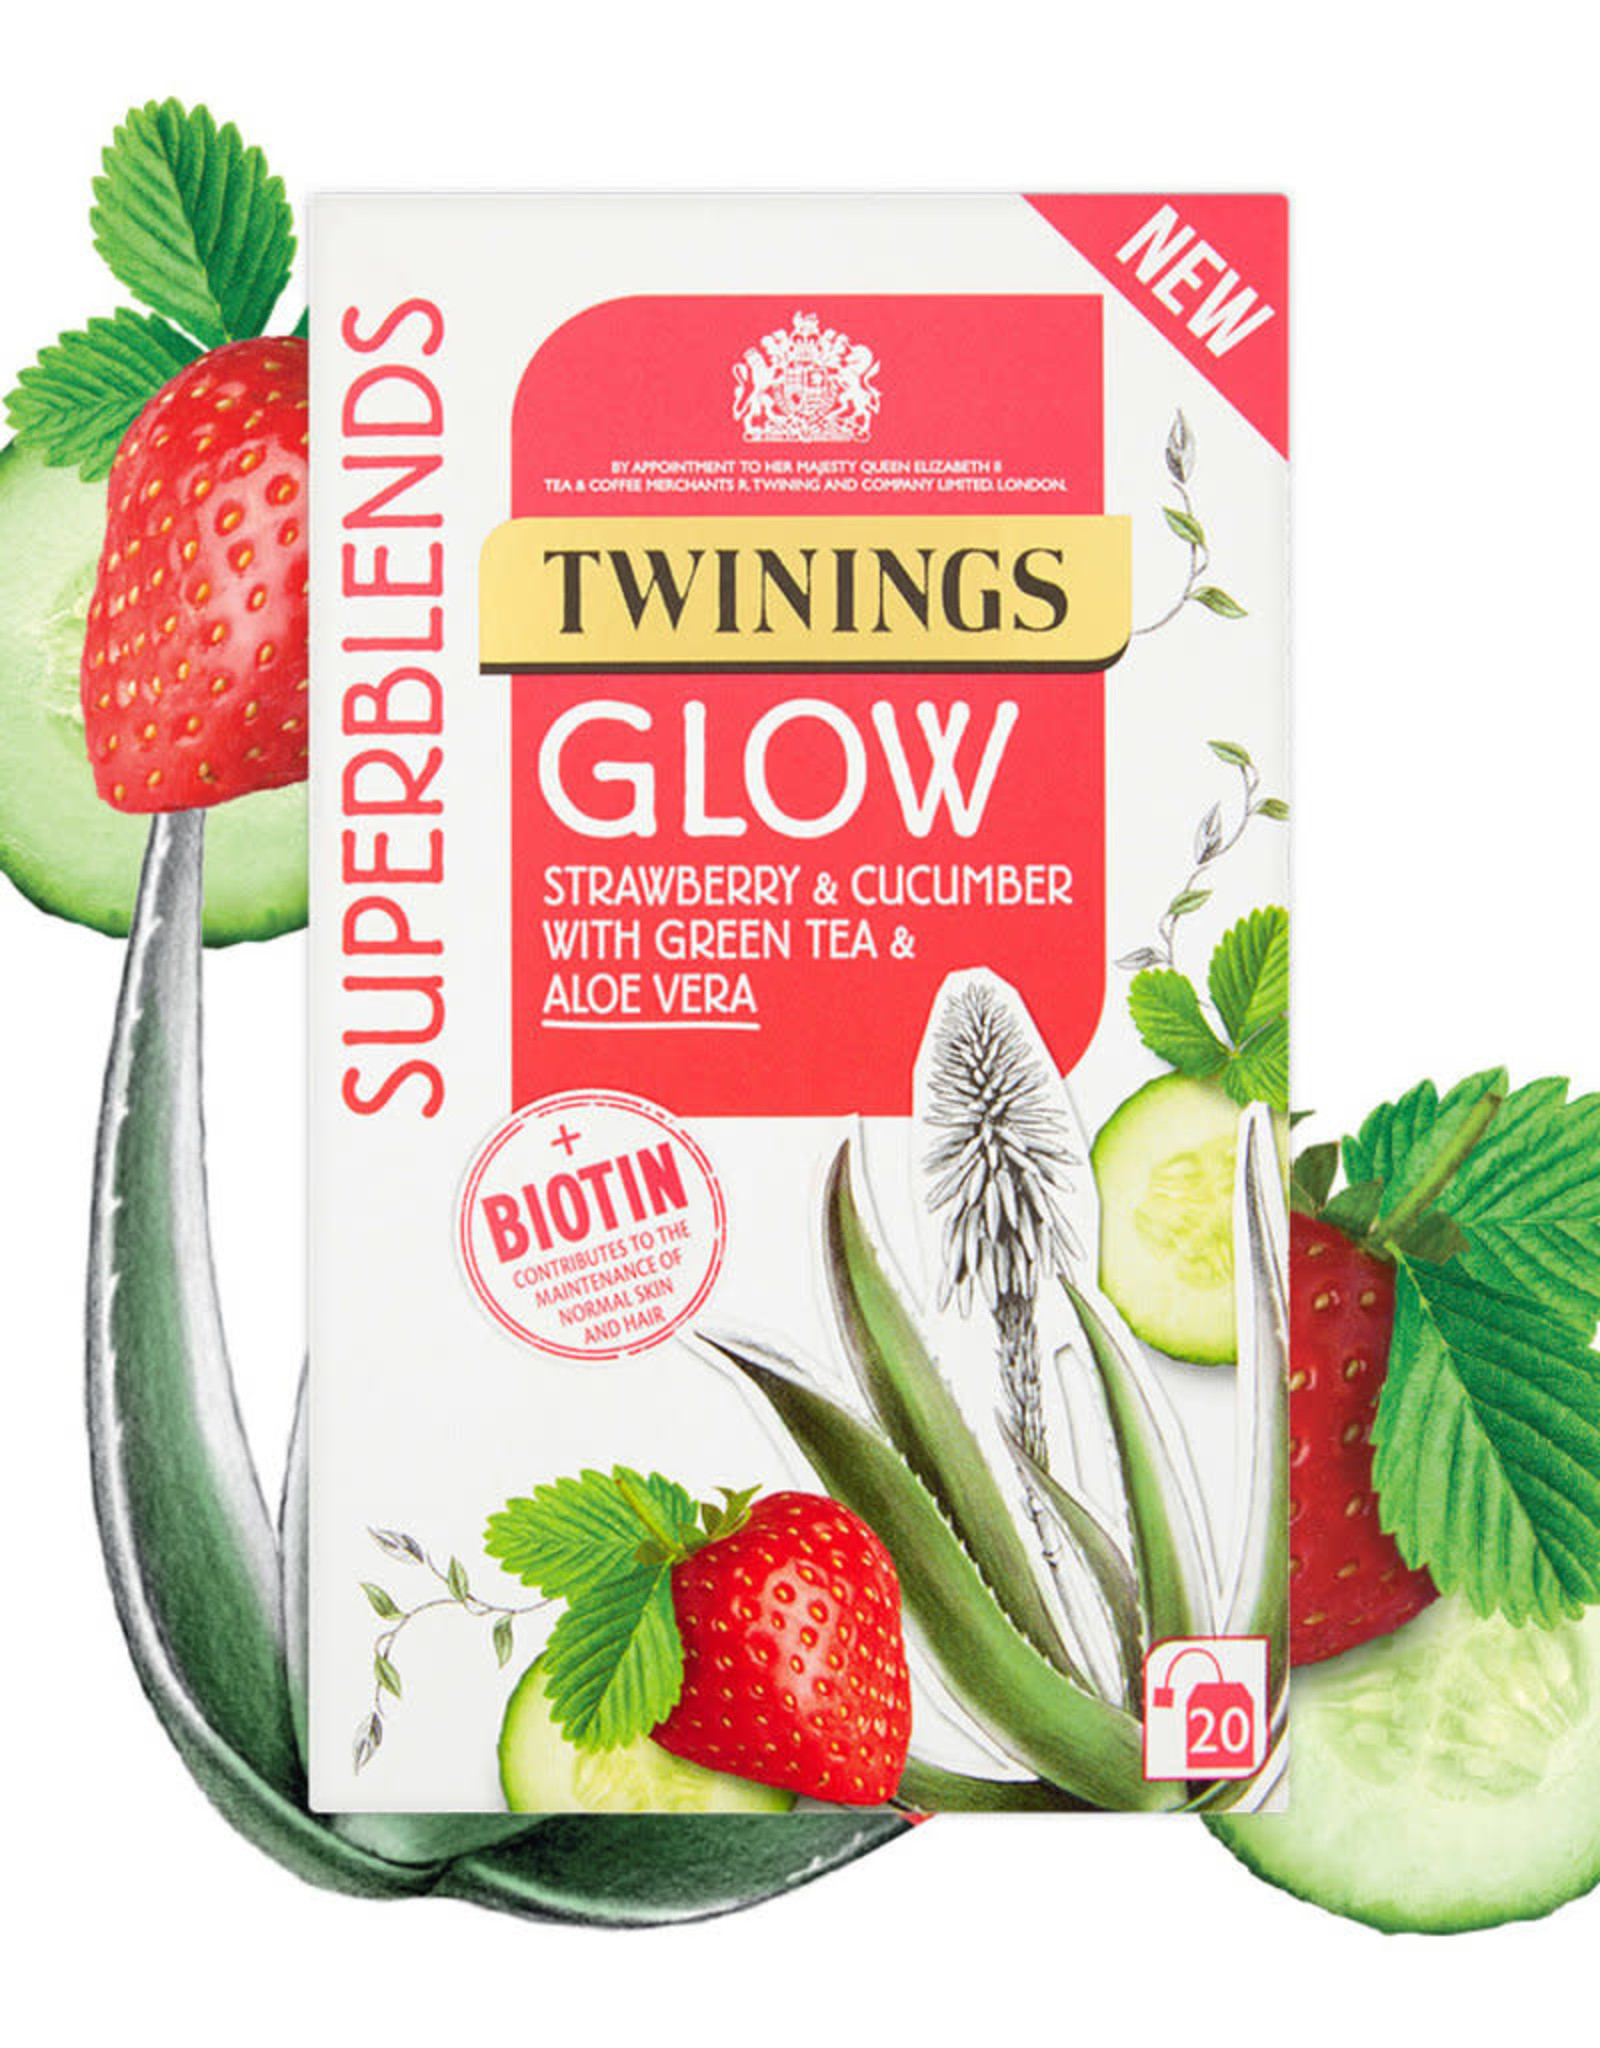 Twinings Twinings Glow Strawberry & Cucumber 20's